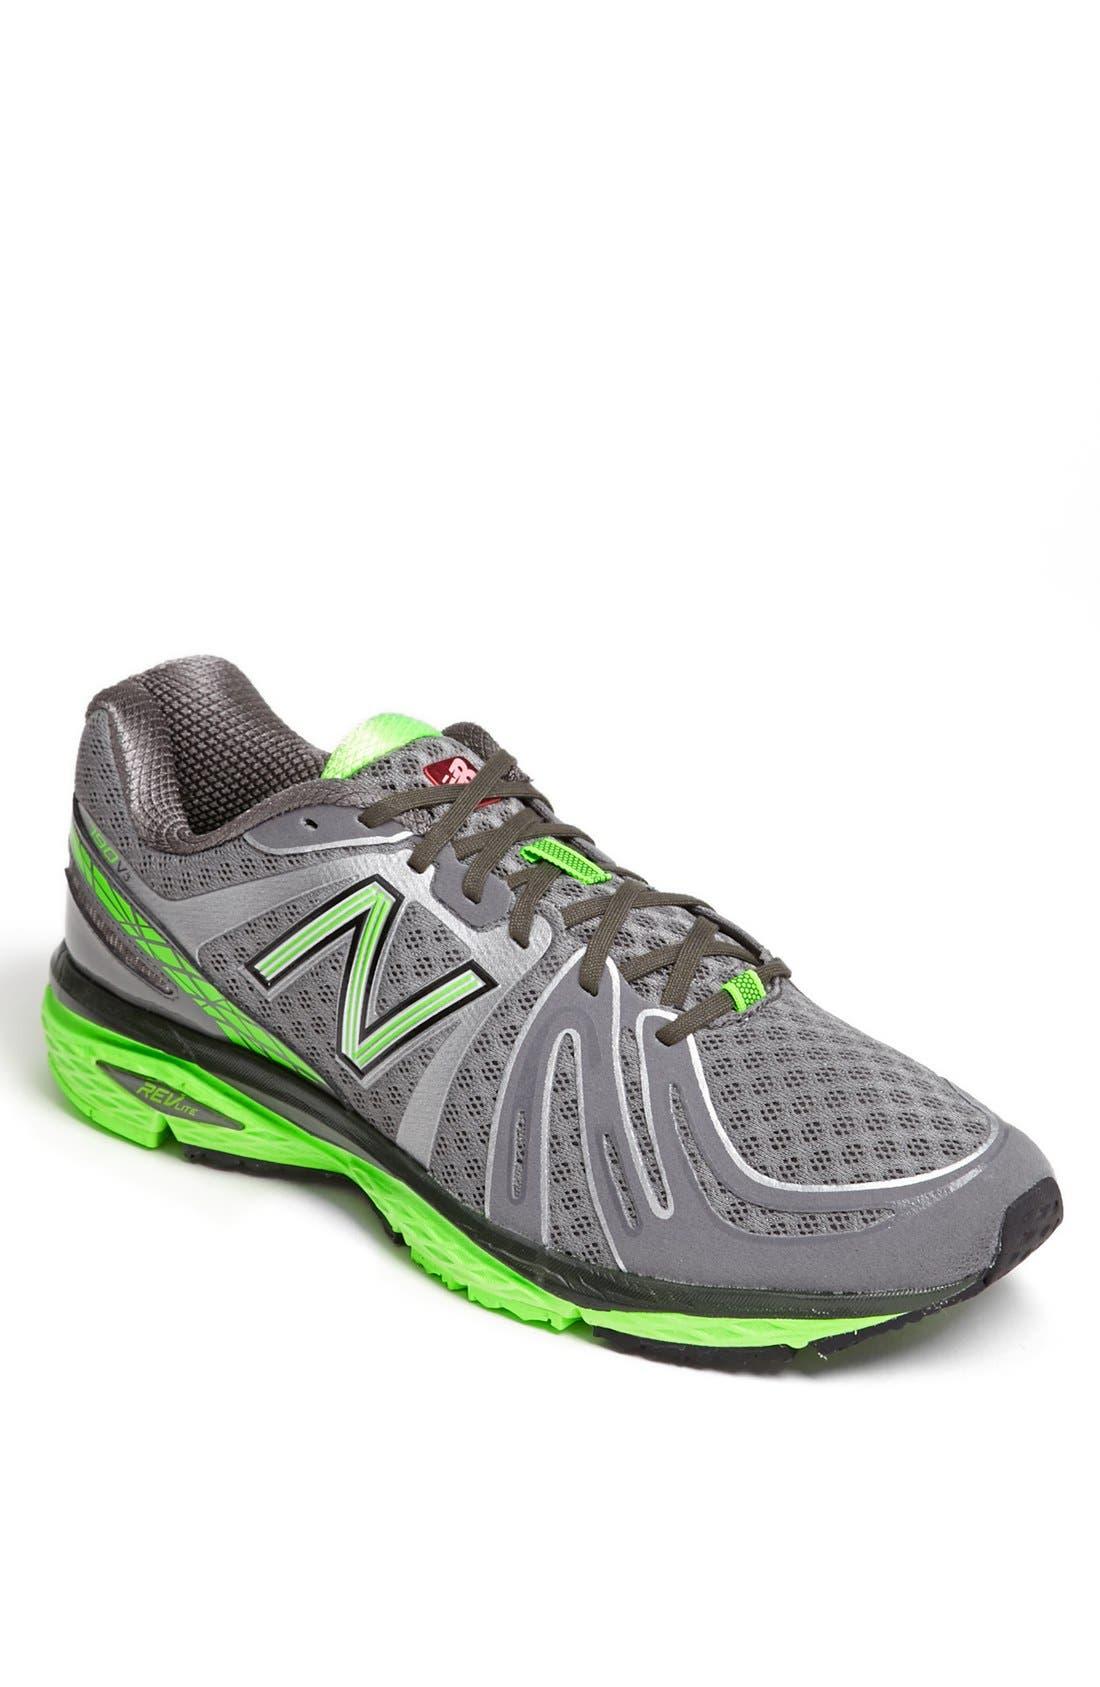 Alternate Image 1 Selected - New Balance '790' Running Shoe (Men) (Online Only Color)